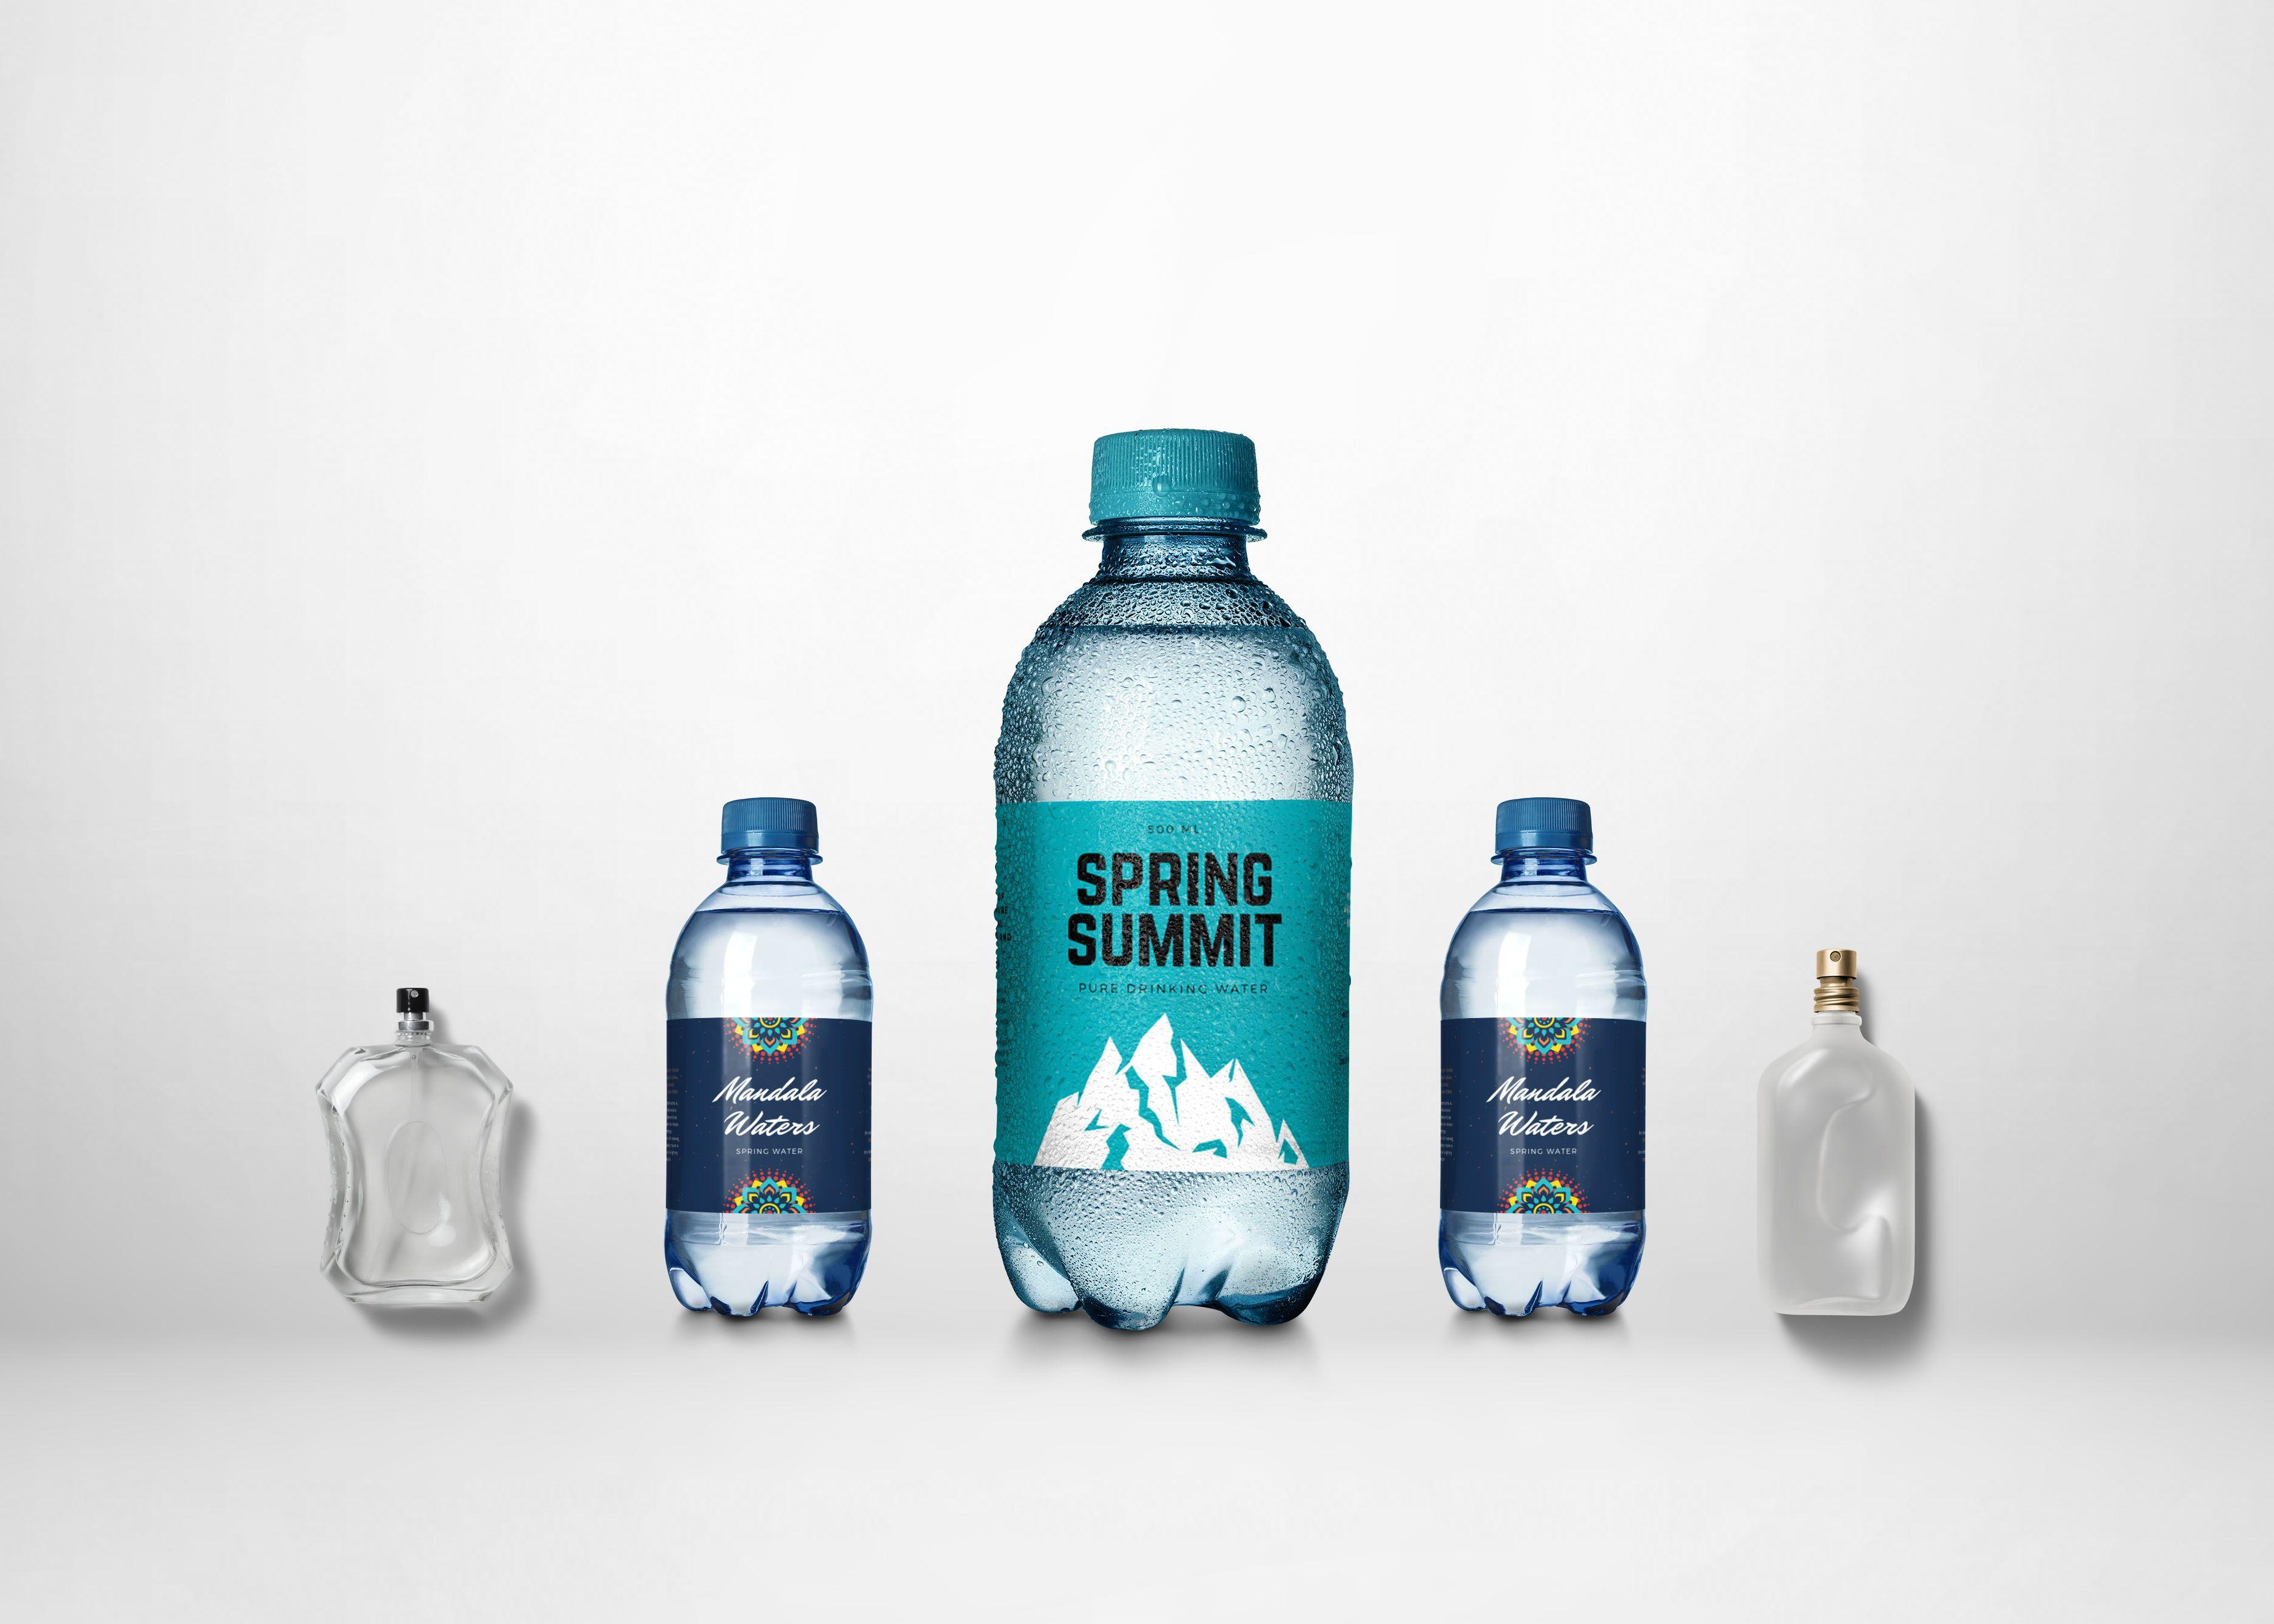 Mini Water Bottle Label Design Mockup Water Bottle Label Design Bottle Label Design Mini Water Bottles